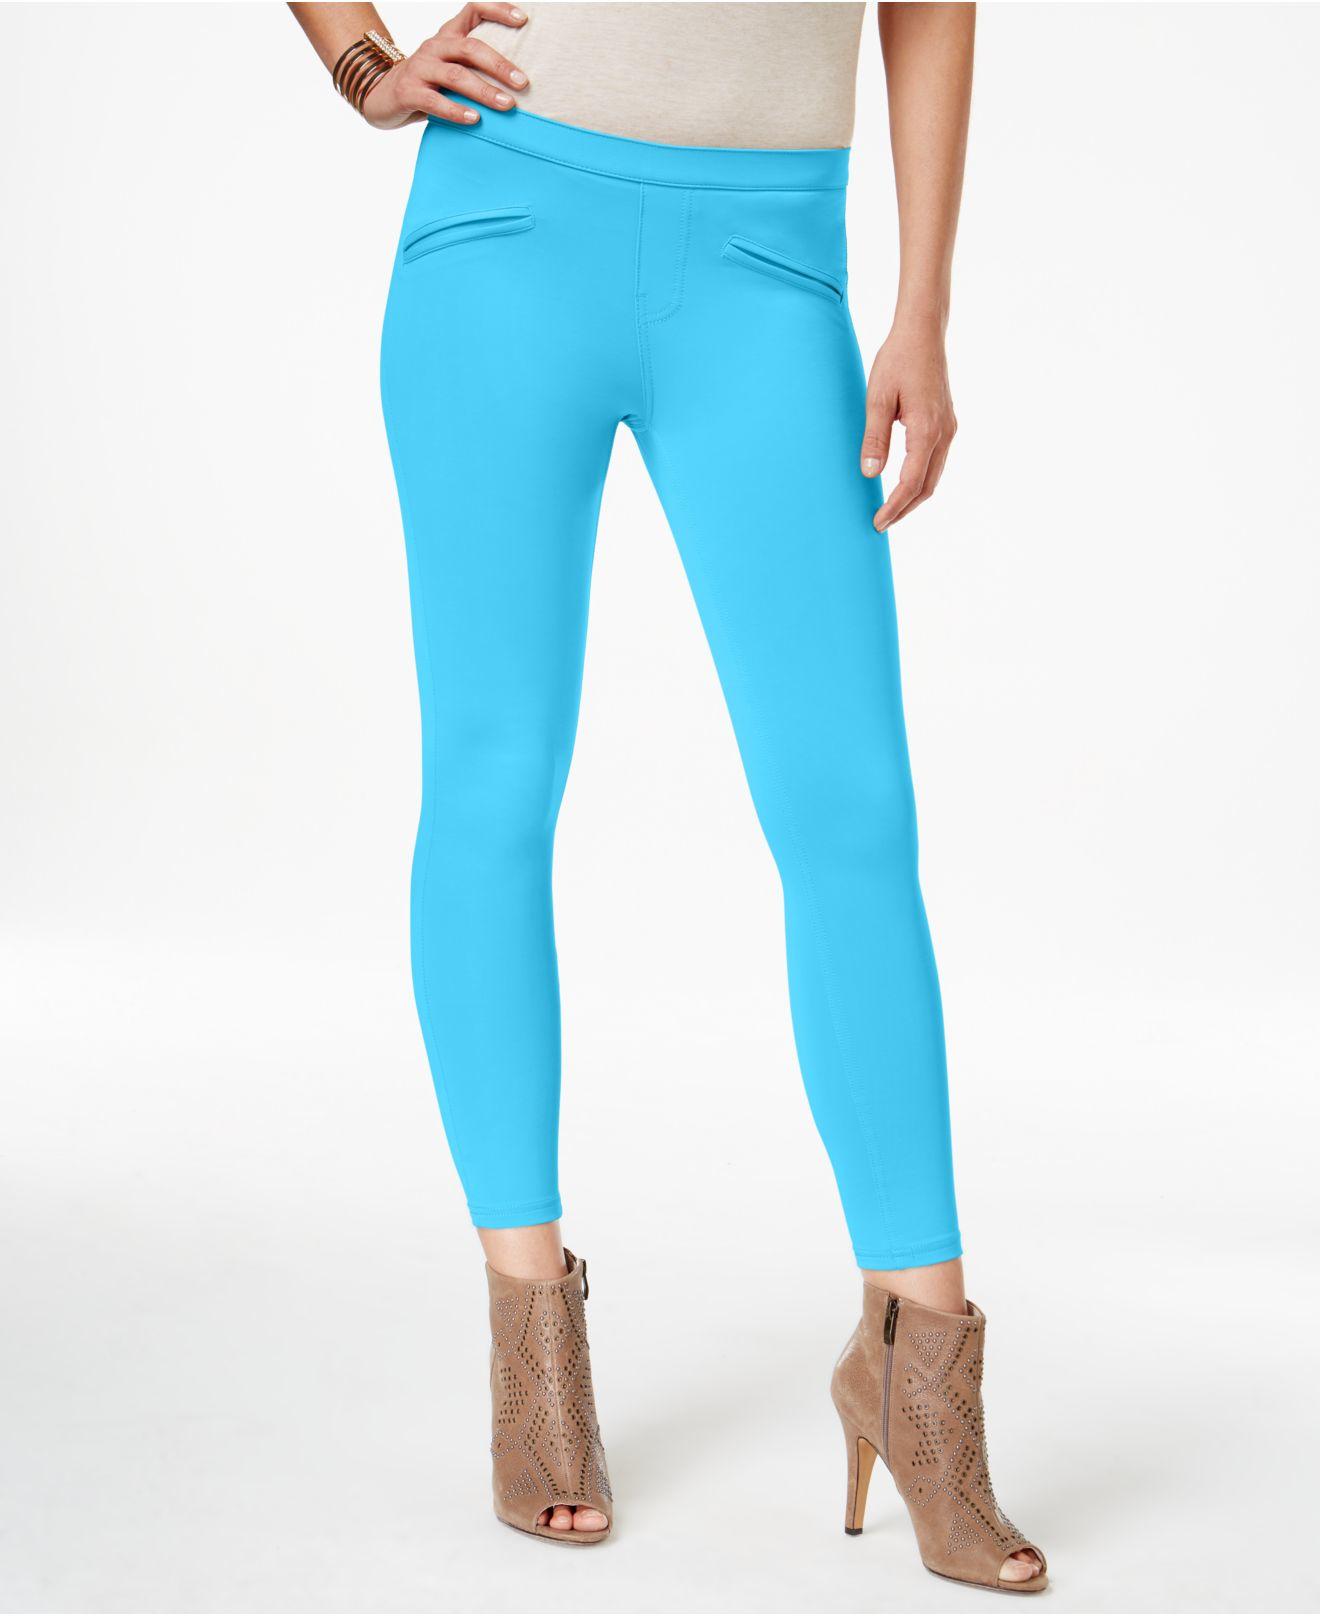 bbe8f1450ce153 Lyst - Hue Satin Jersey Skimmer Leggings in Blue